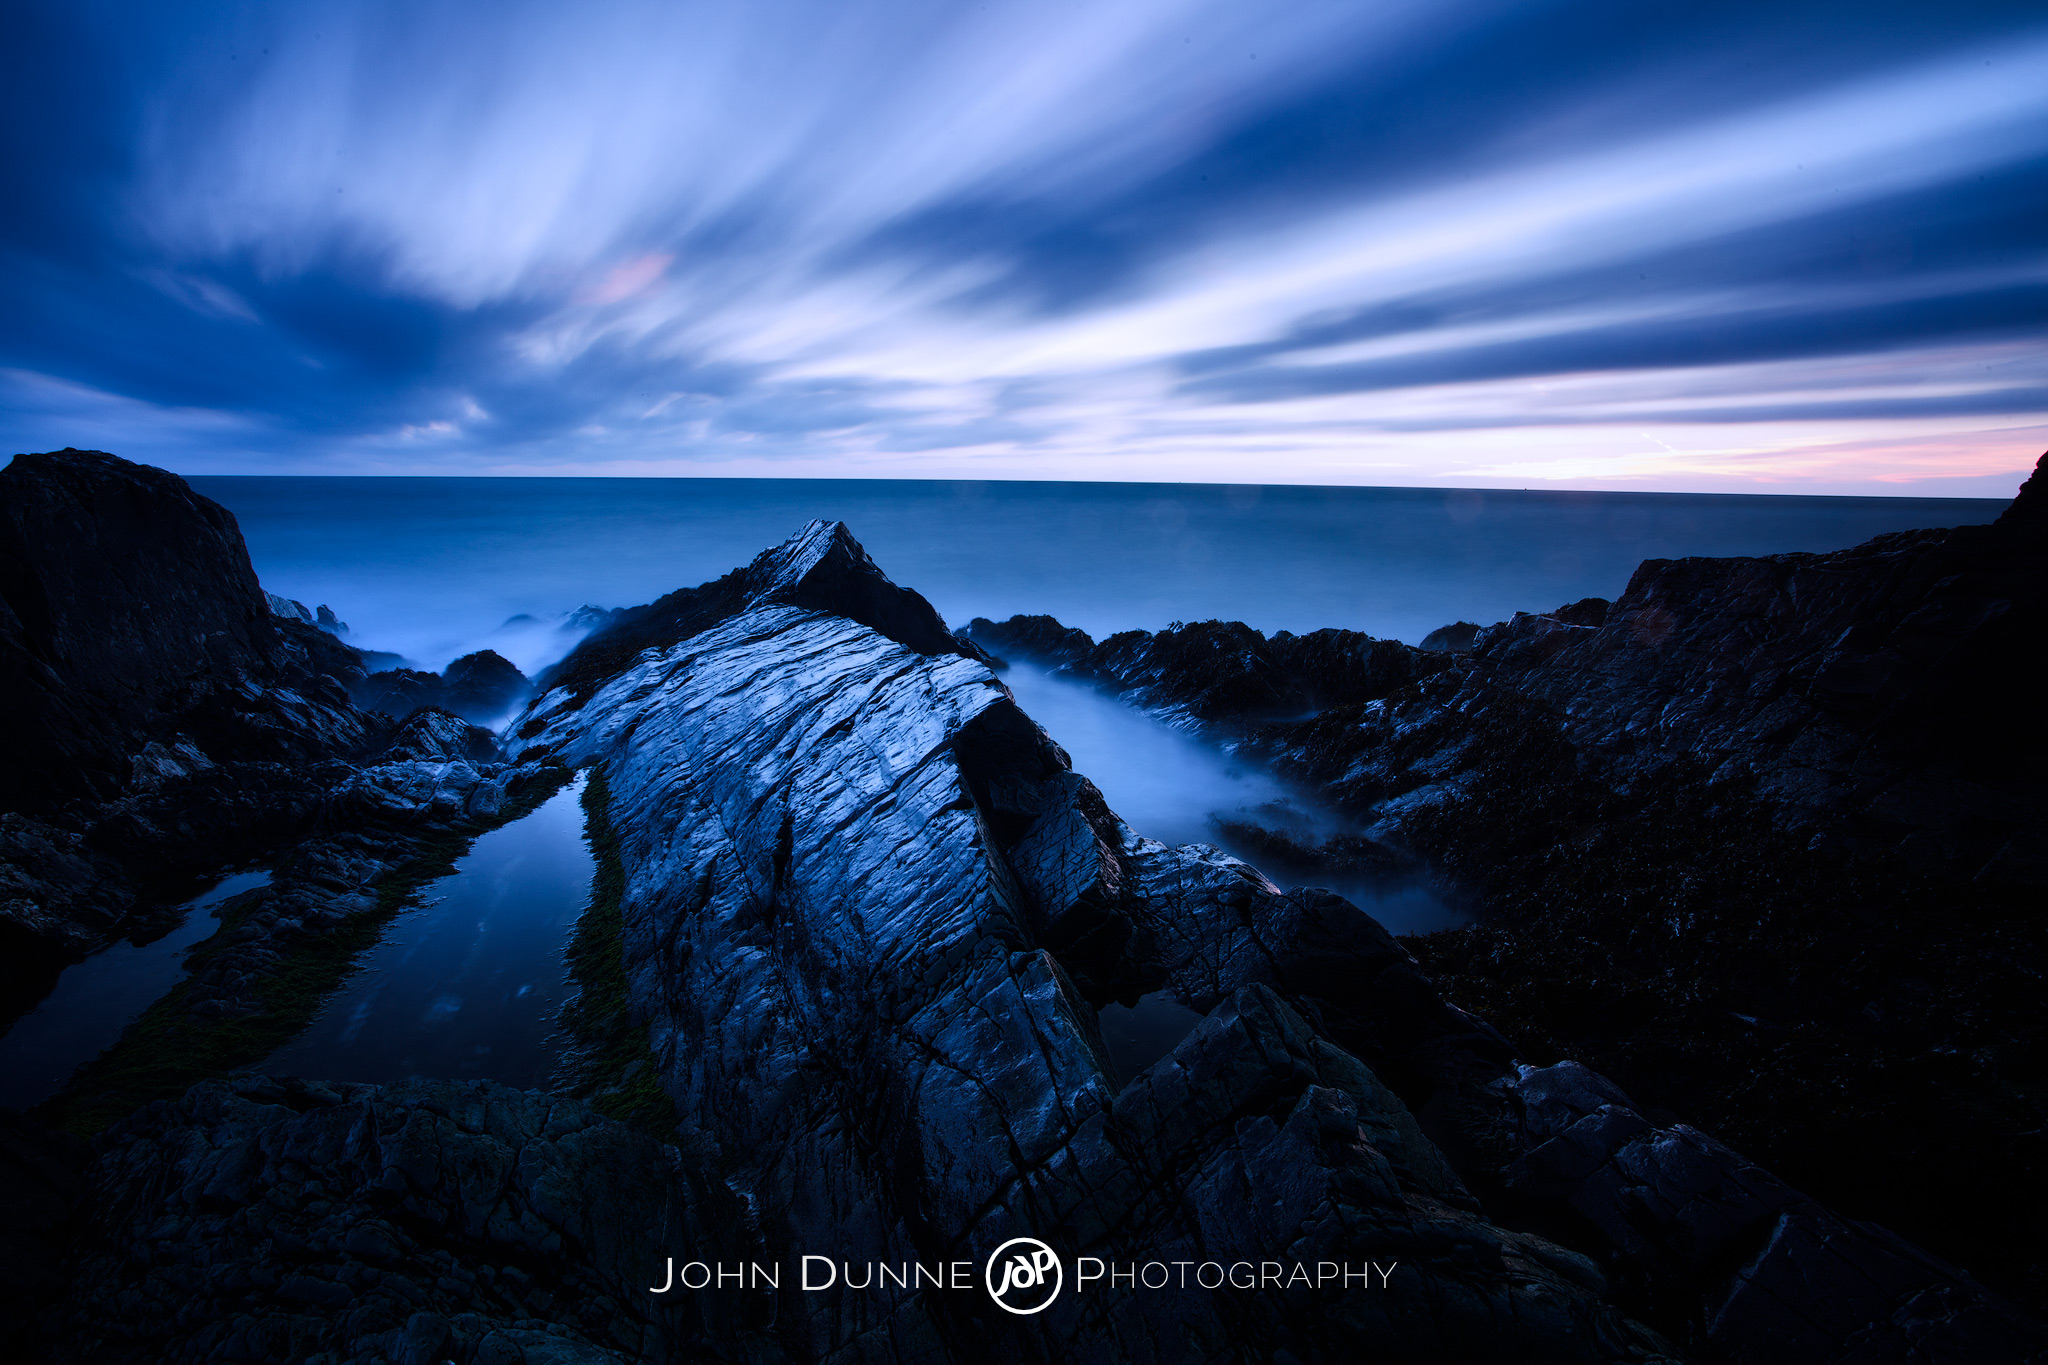 Predawn at Greystones Beach by John Dunne.